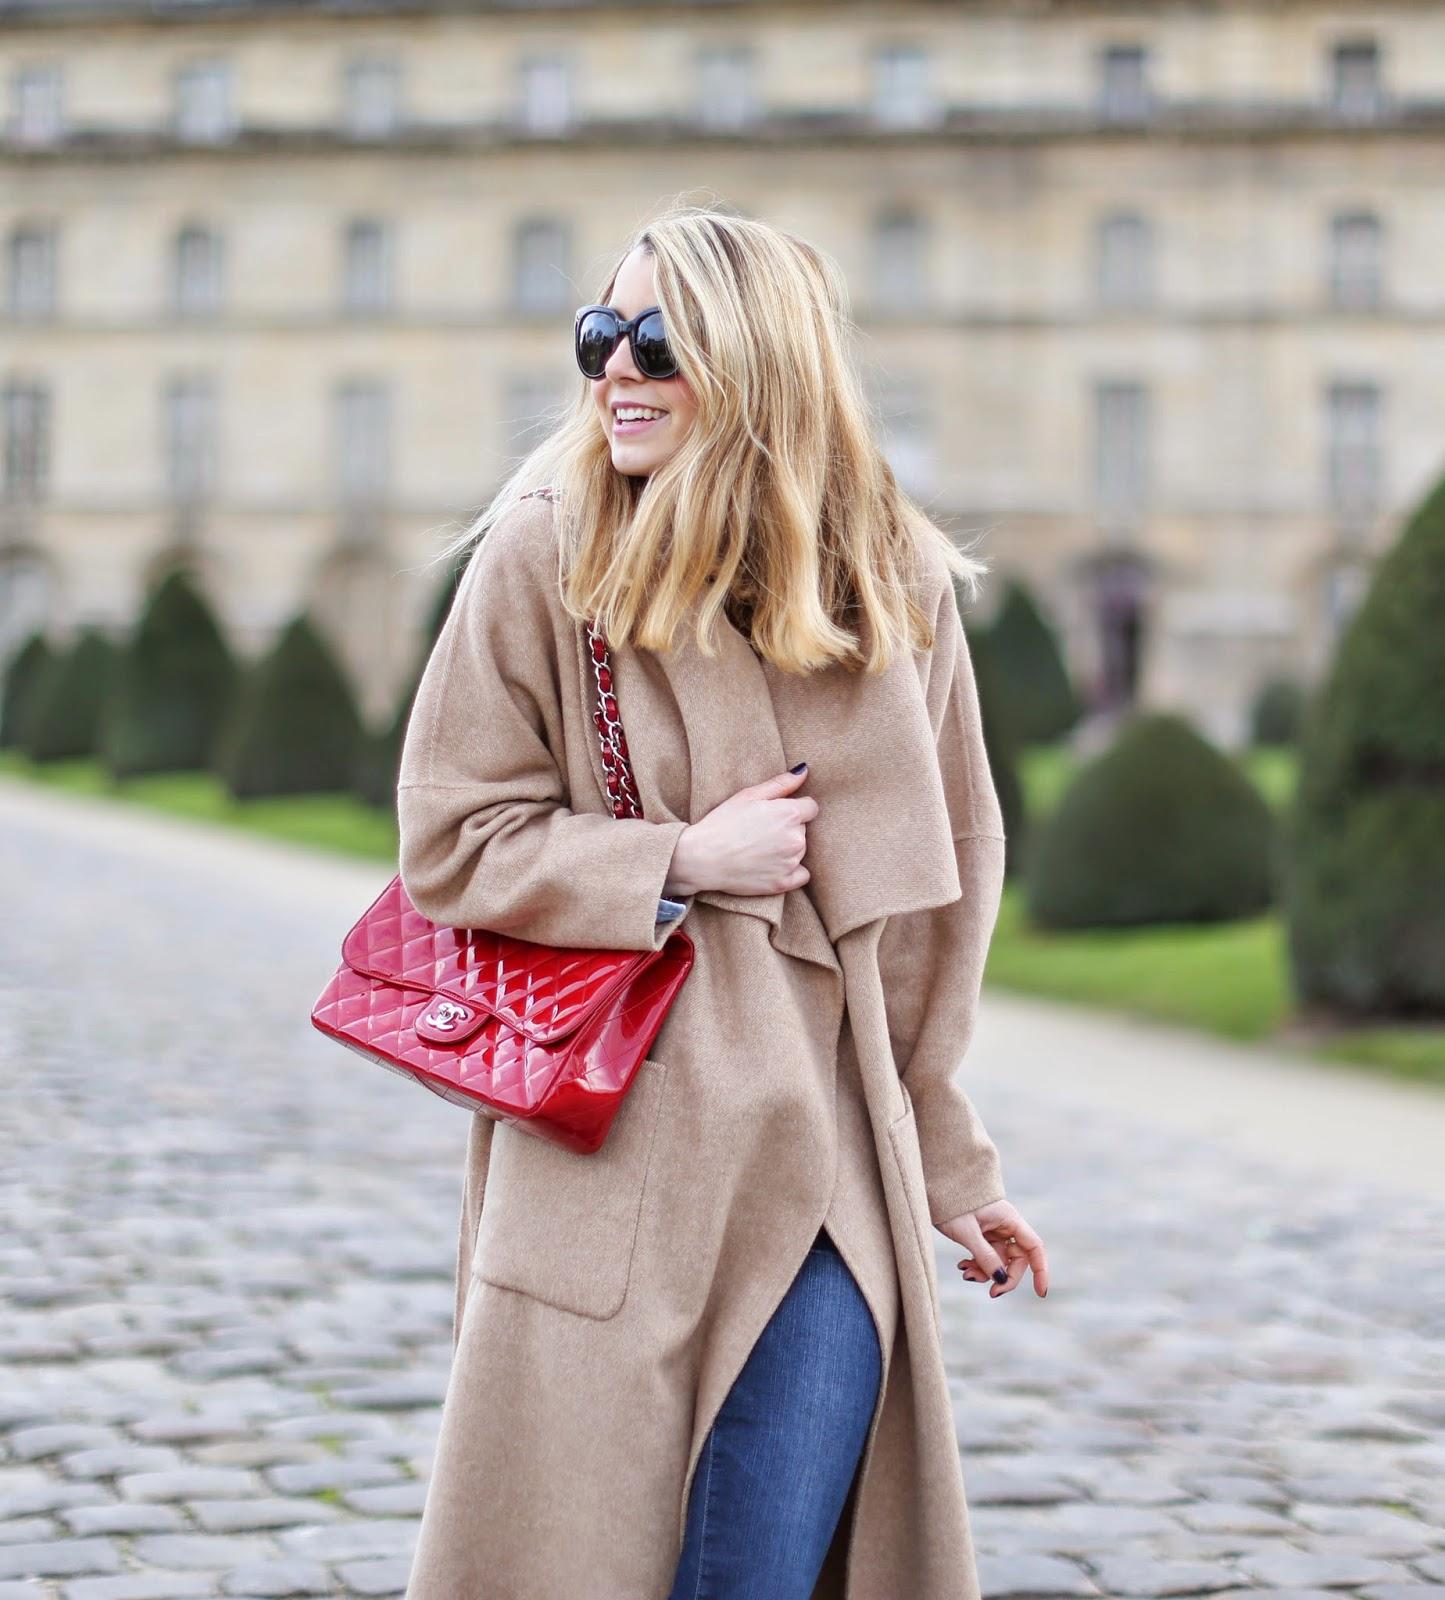 denim on denim, camel coat, zara, topshop, chanel, frame denim, python heels, streetstyle, fashion blogger, paris